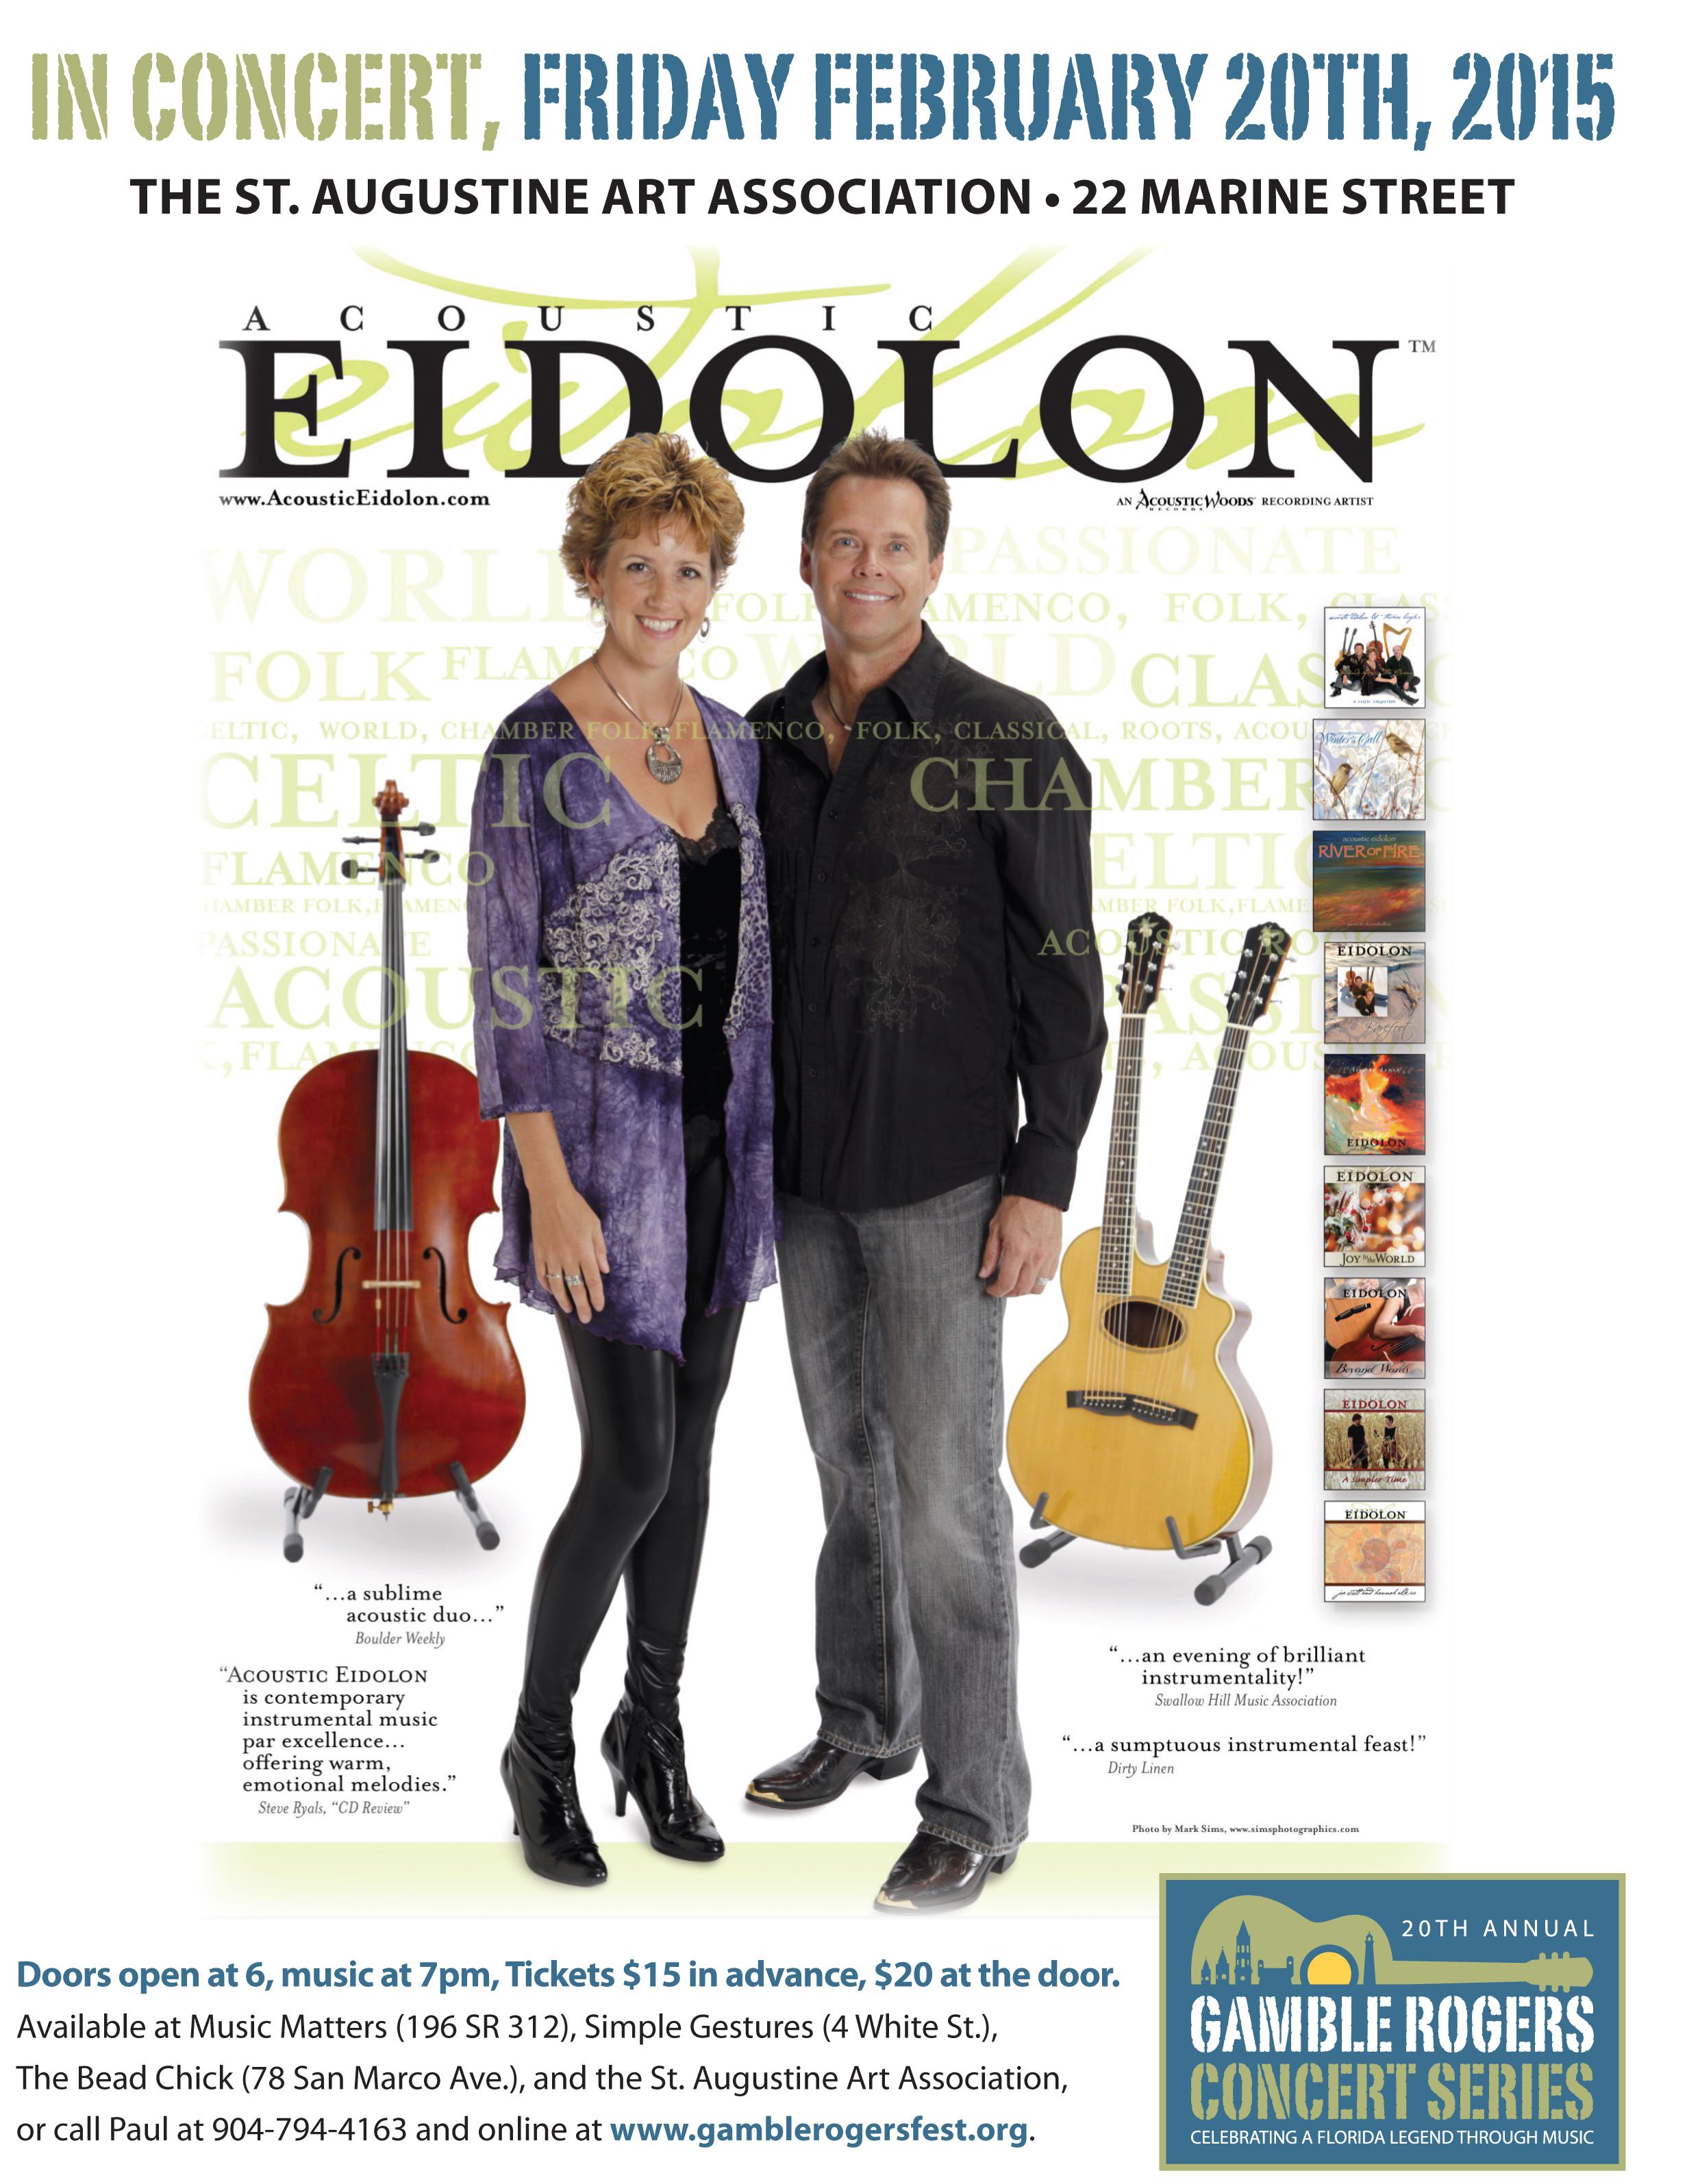 Acoustic Eidolon to perform Feb. 20 at St. Augustine Art Association